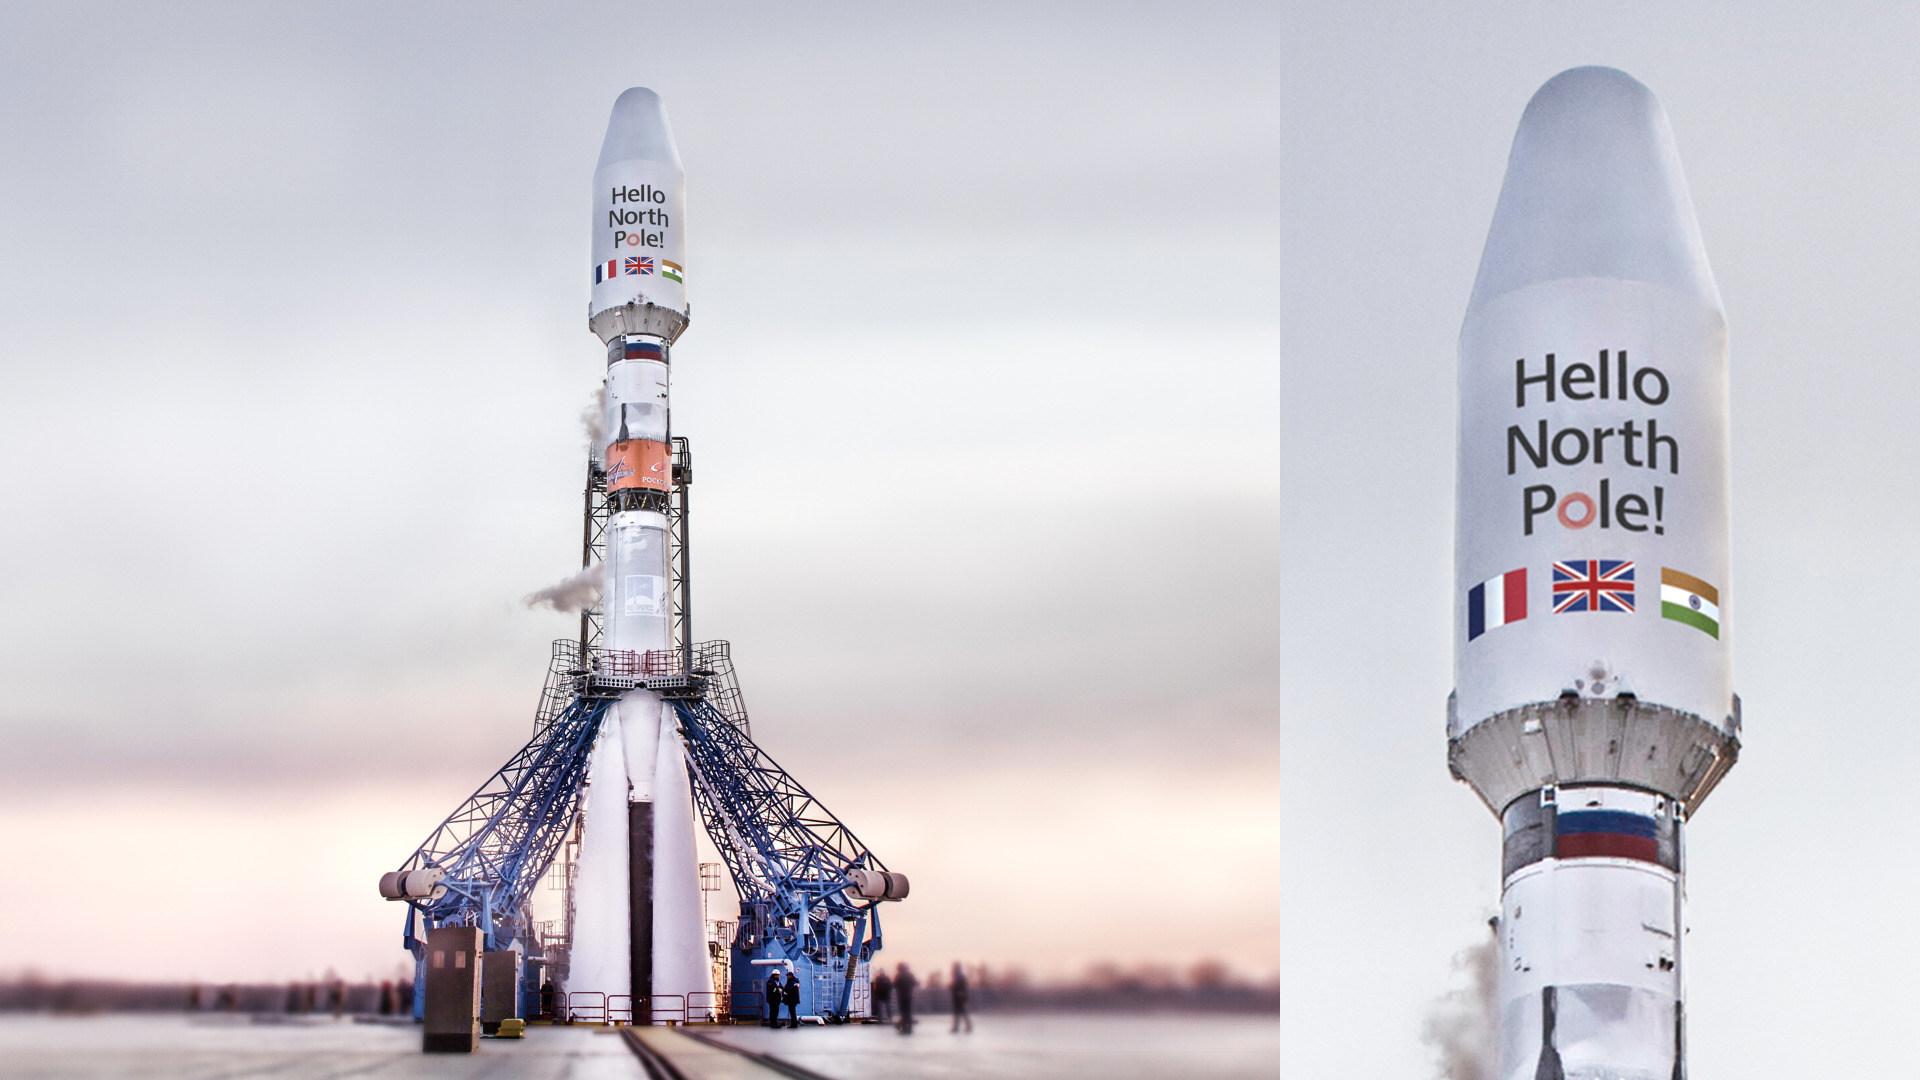 Launch, Weltraum, Satellit, Rakete, Start, OneWeb, Launch #8